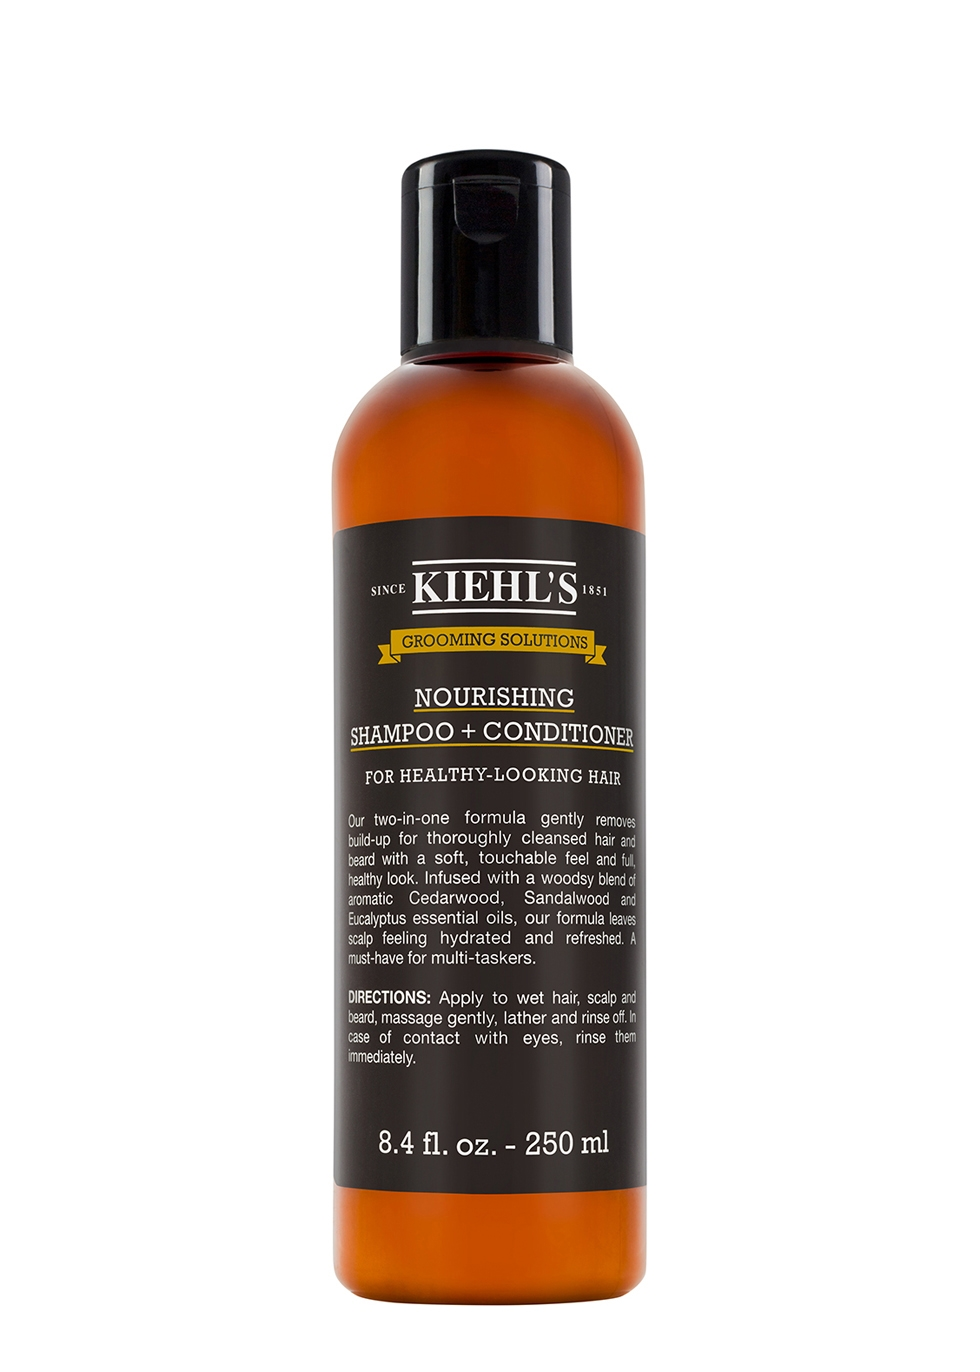 Grooming Solutions Nourishing Shampoo & Conditioner 250ml